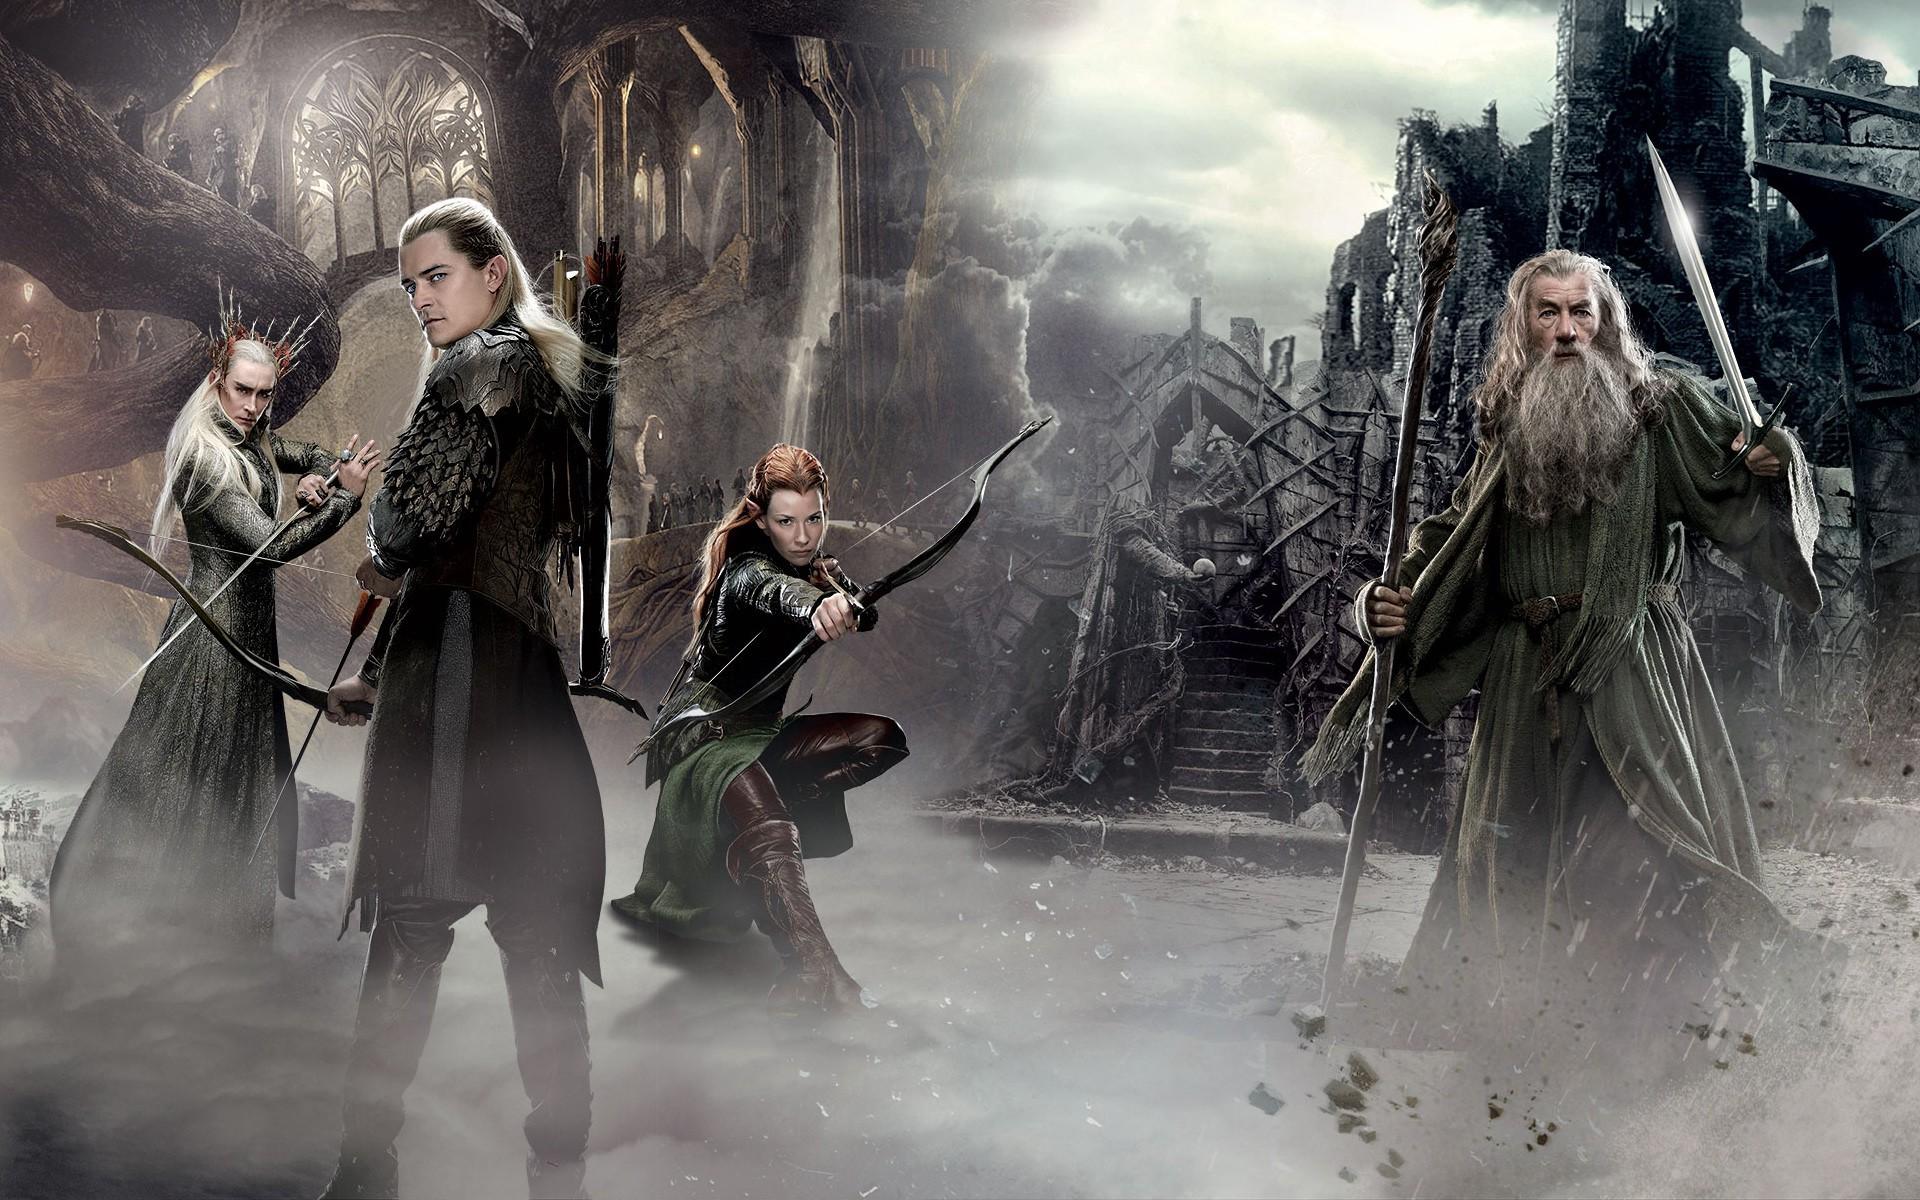 Gandalf Legolas Tauriel Elves Wizard Thranduil Lord Of The